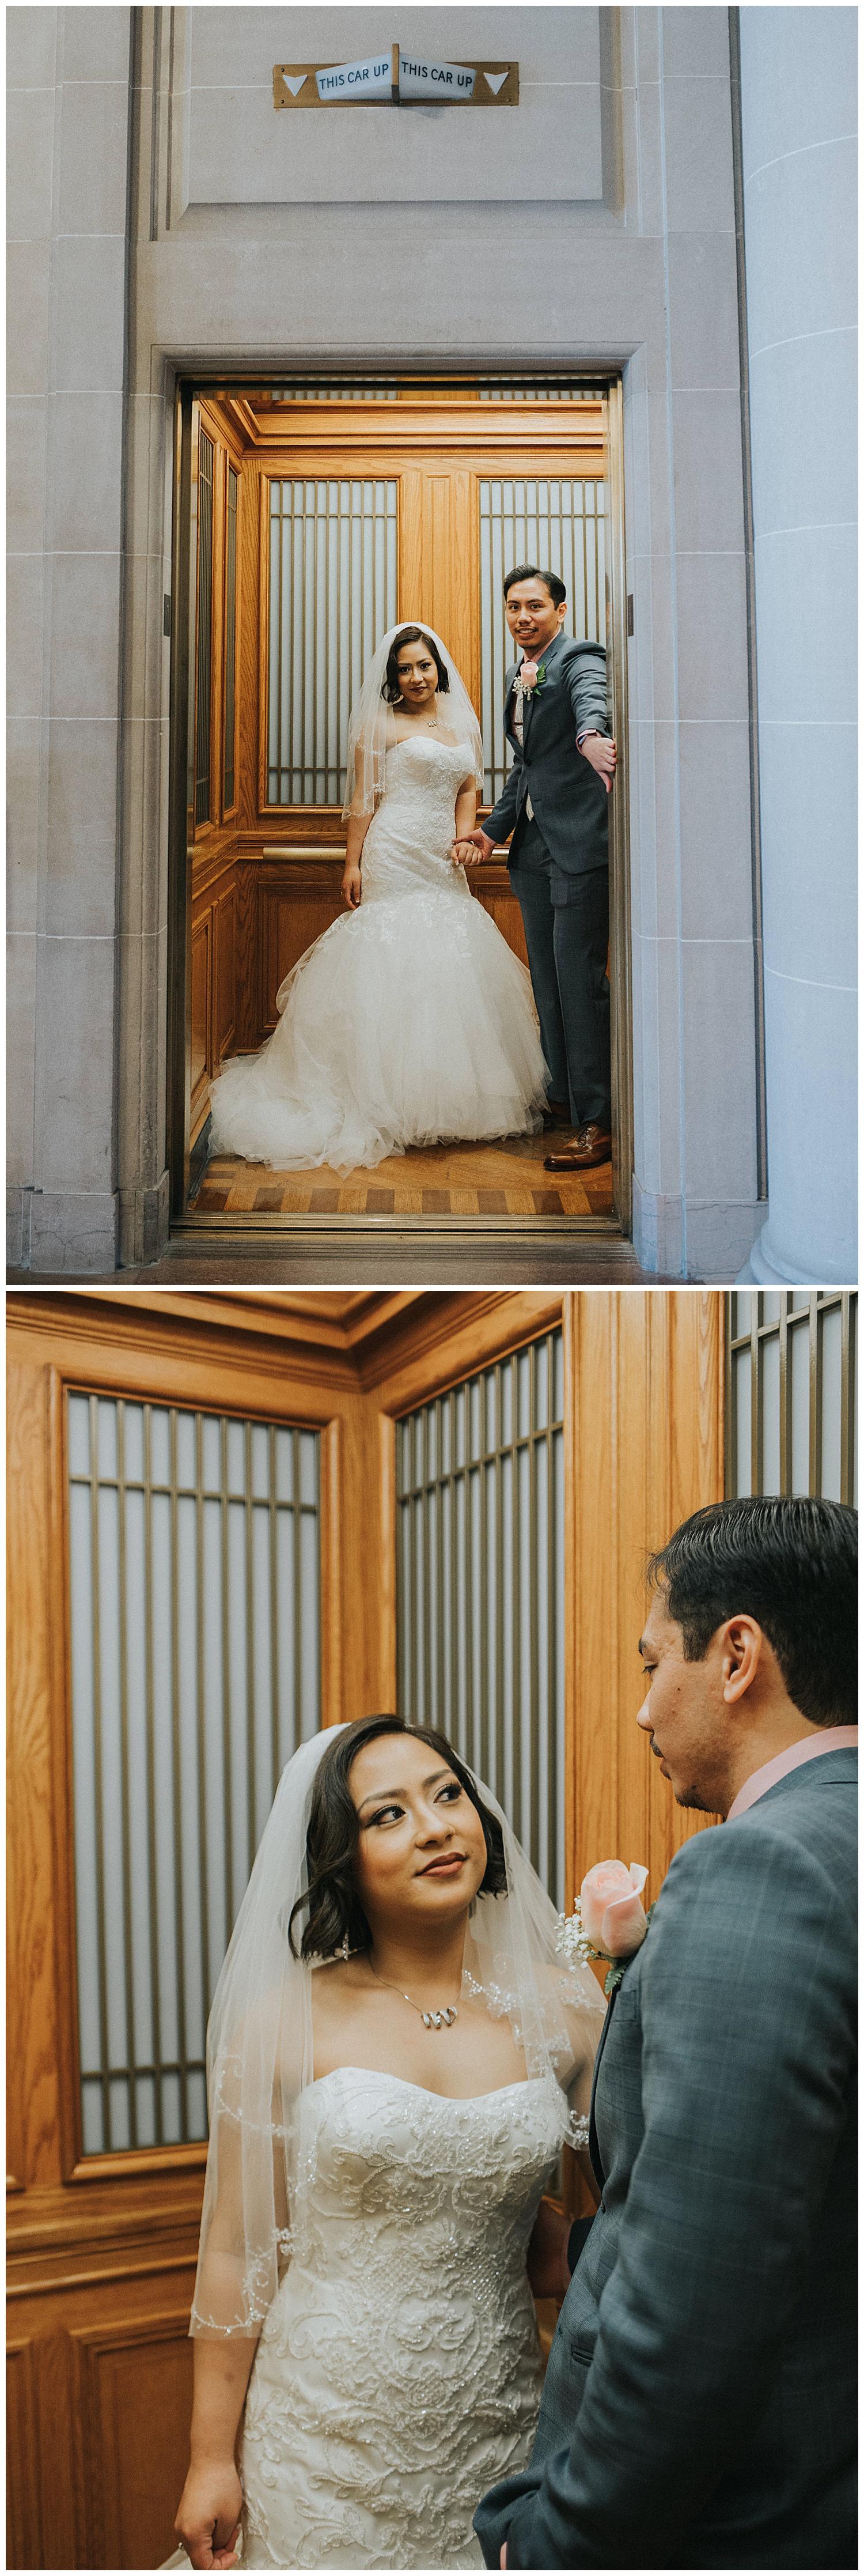 khariza-rae-photography-bay-area-wedding-photographer_0092.jpg